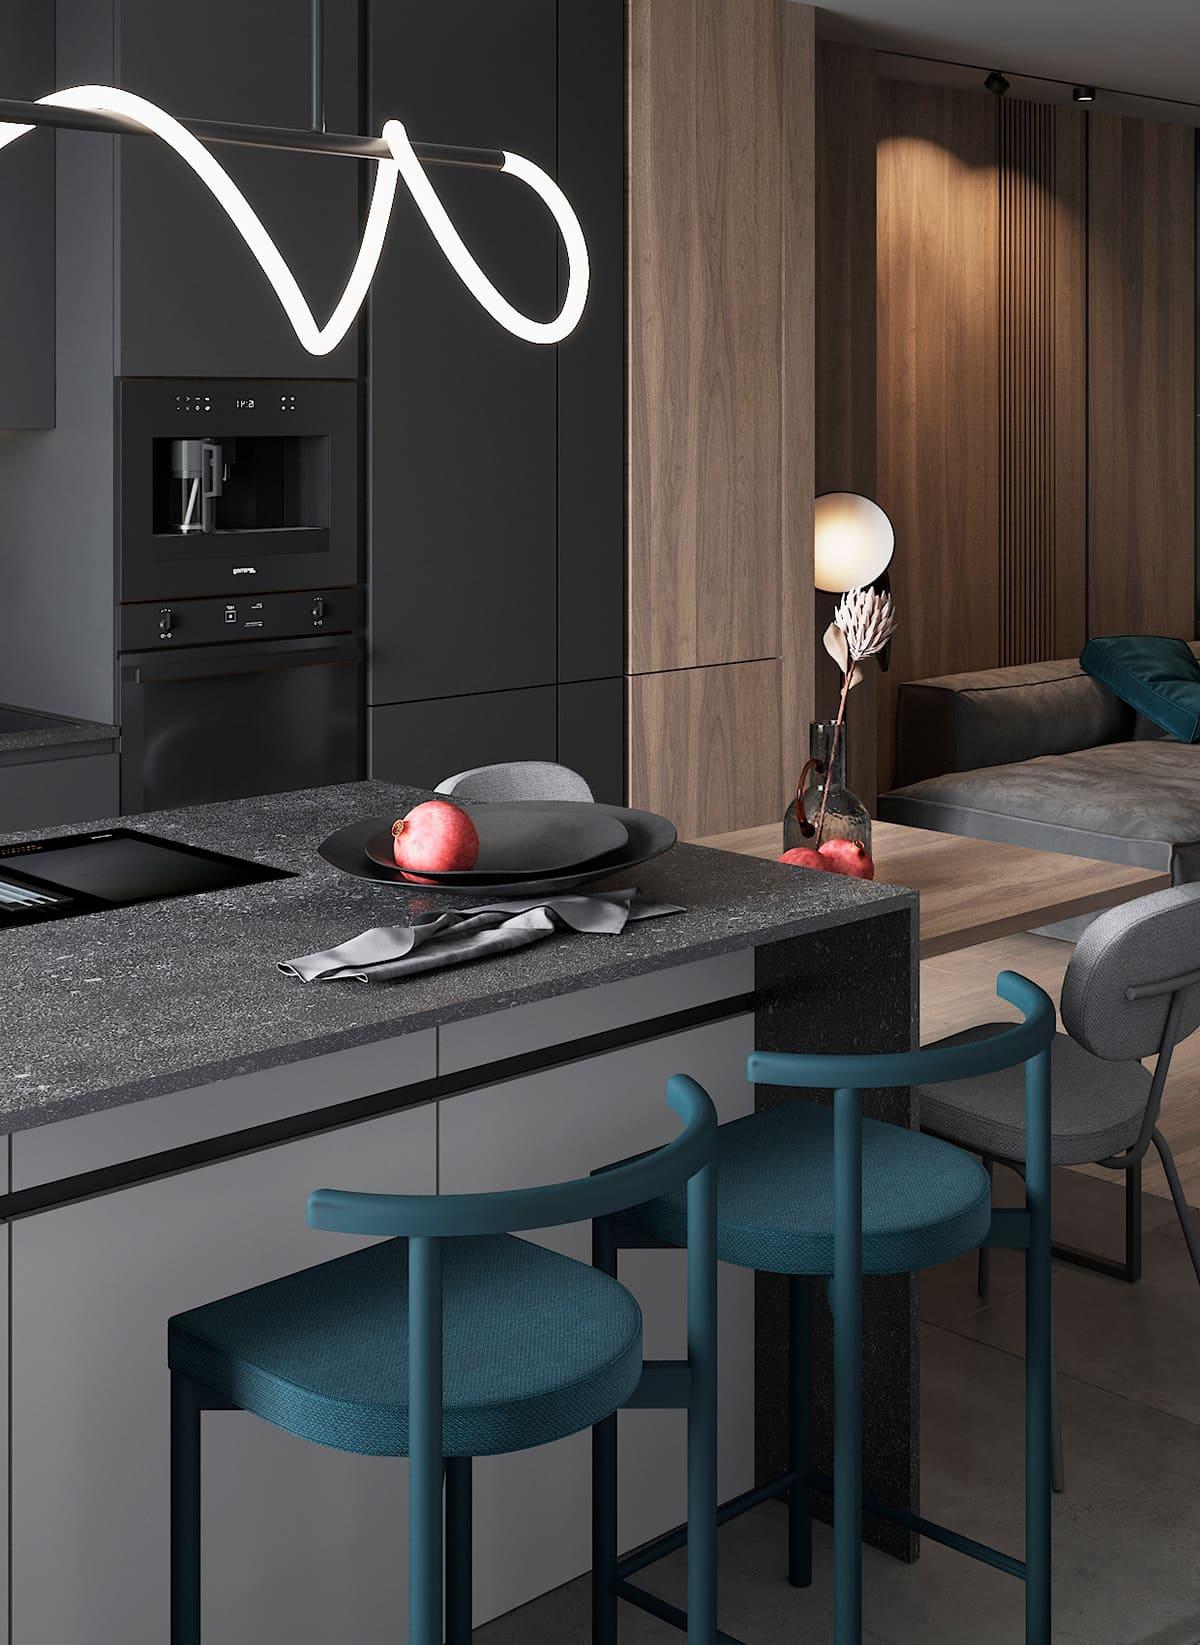 модный дизайн интерьера квартиры фото 55